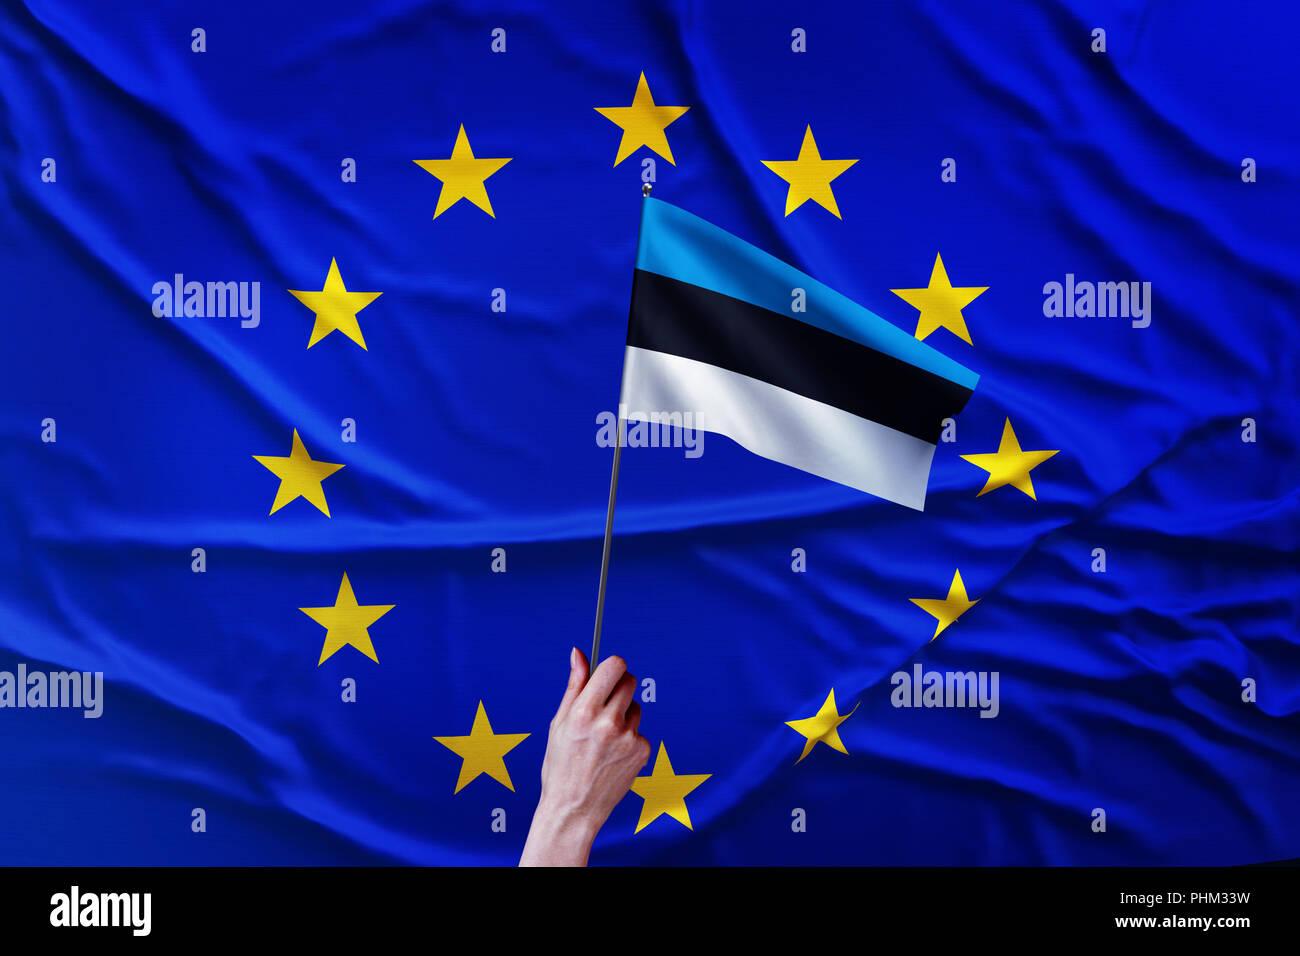 Flag of the European Union and Estonia - Stock Image